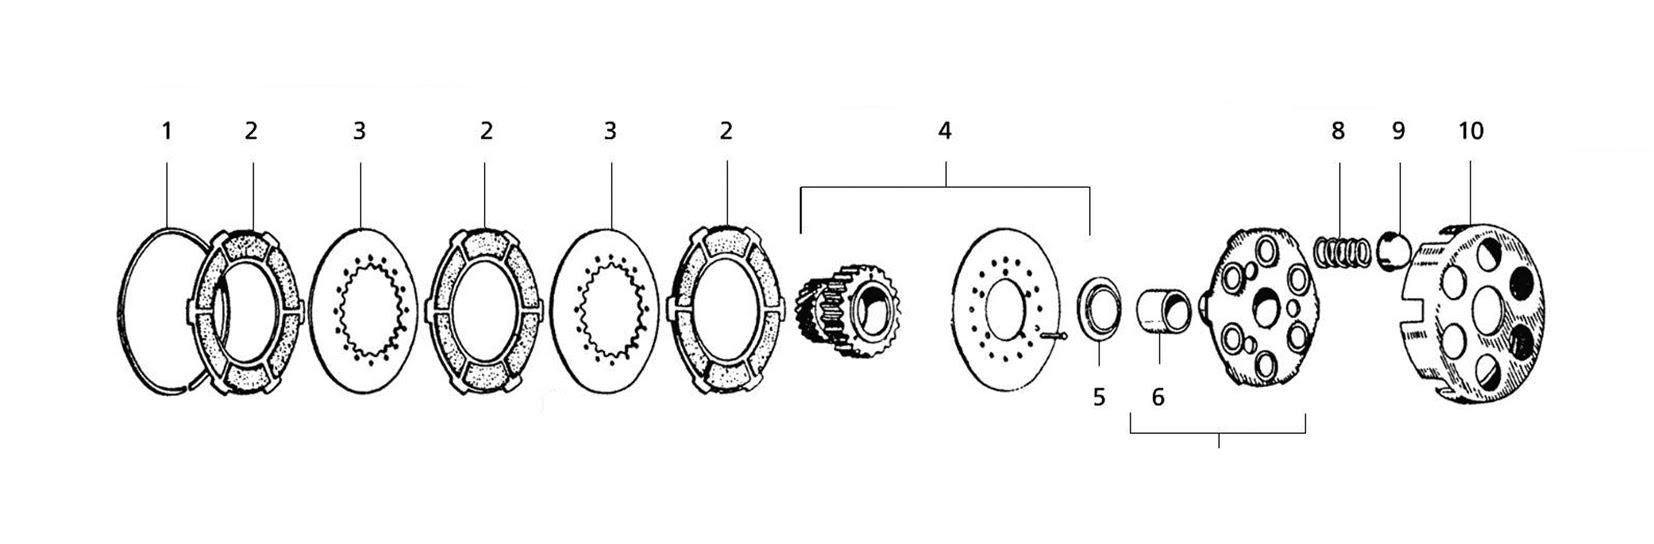 P series Clutch 7-spring.jpg